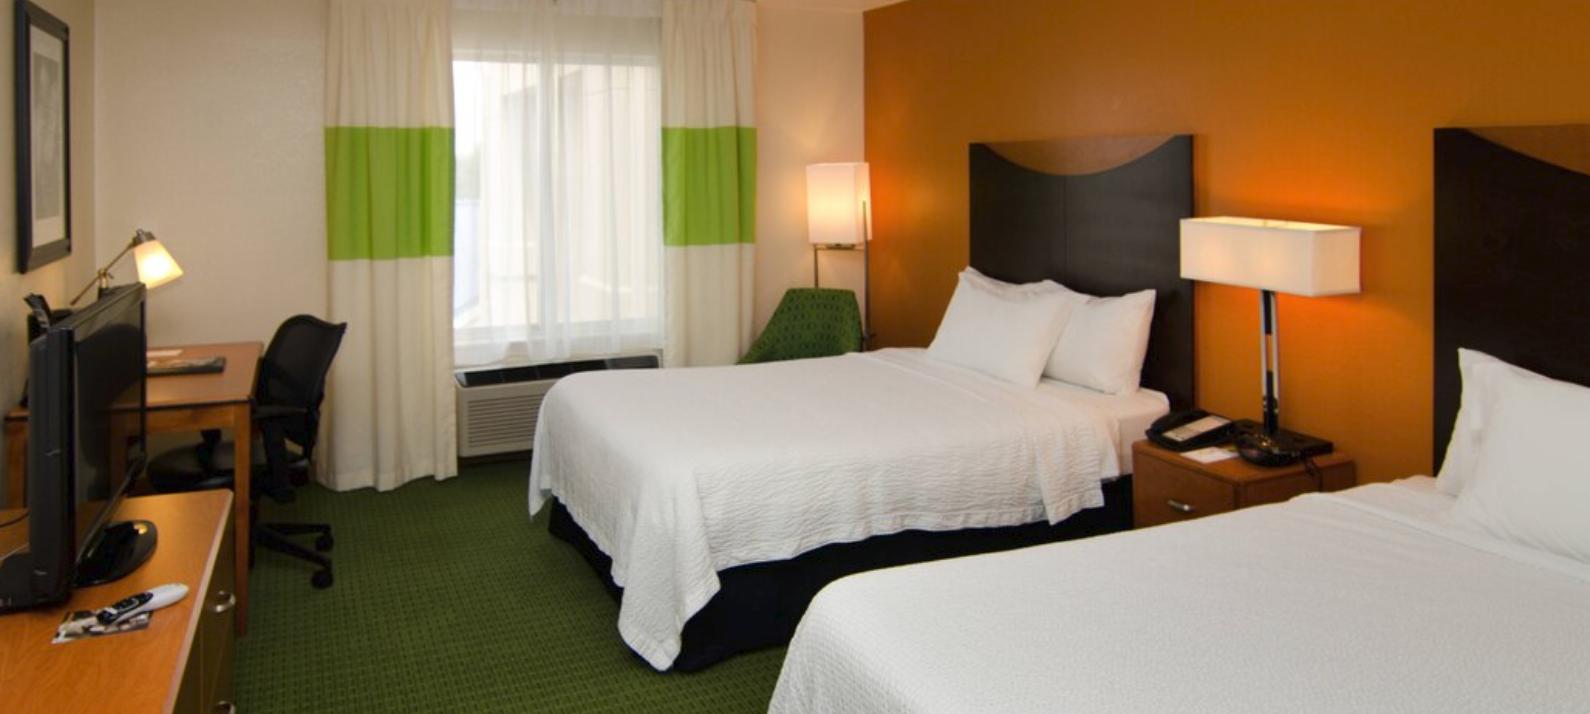 https://www.hotelsbyday.com/_data/default-hotel_image/4/20561/screenshot-2020-08-14-at-12-50-40-pm.png